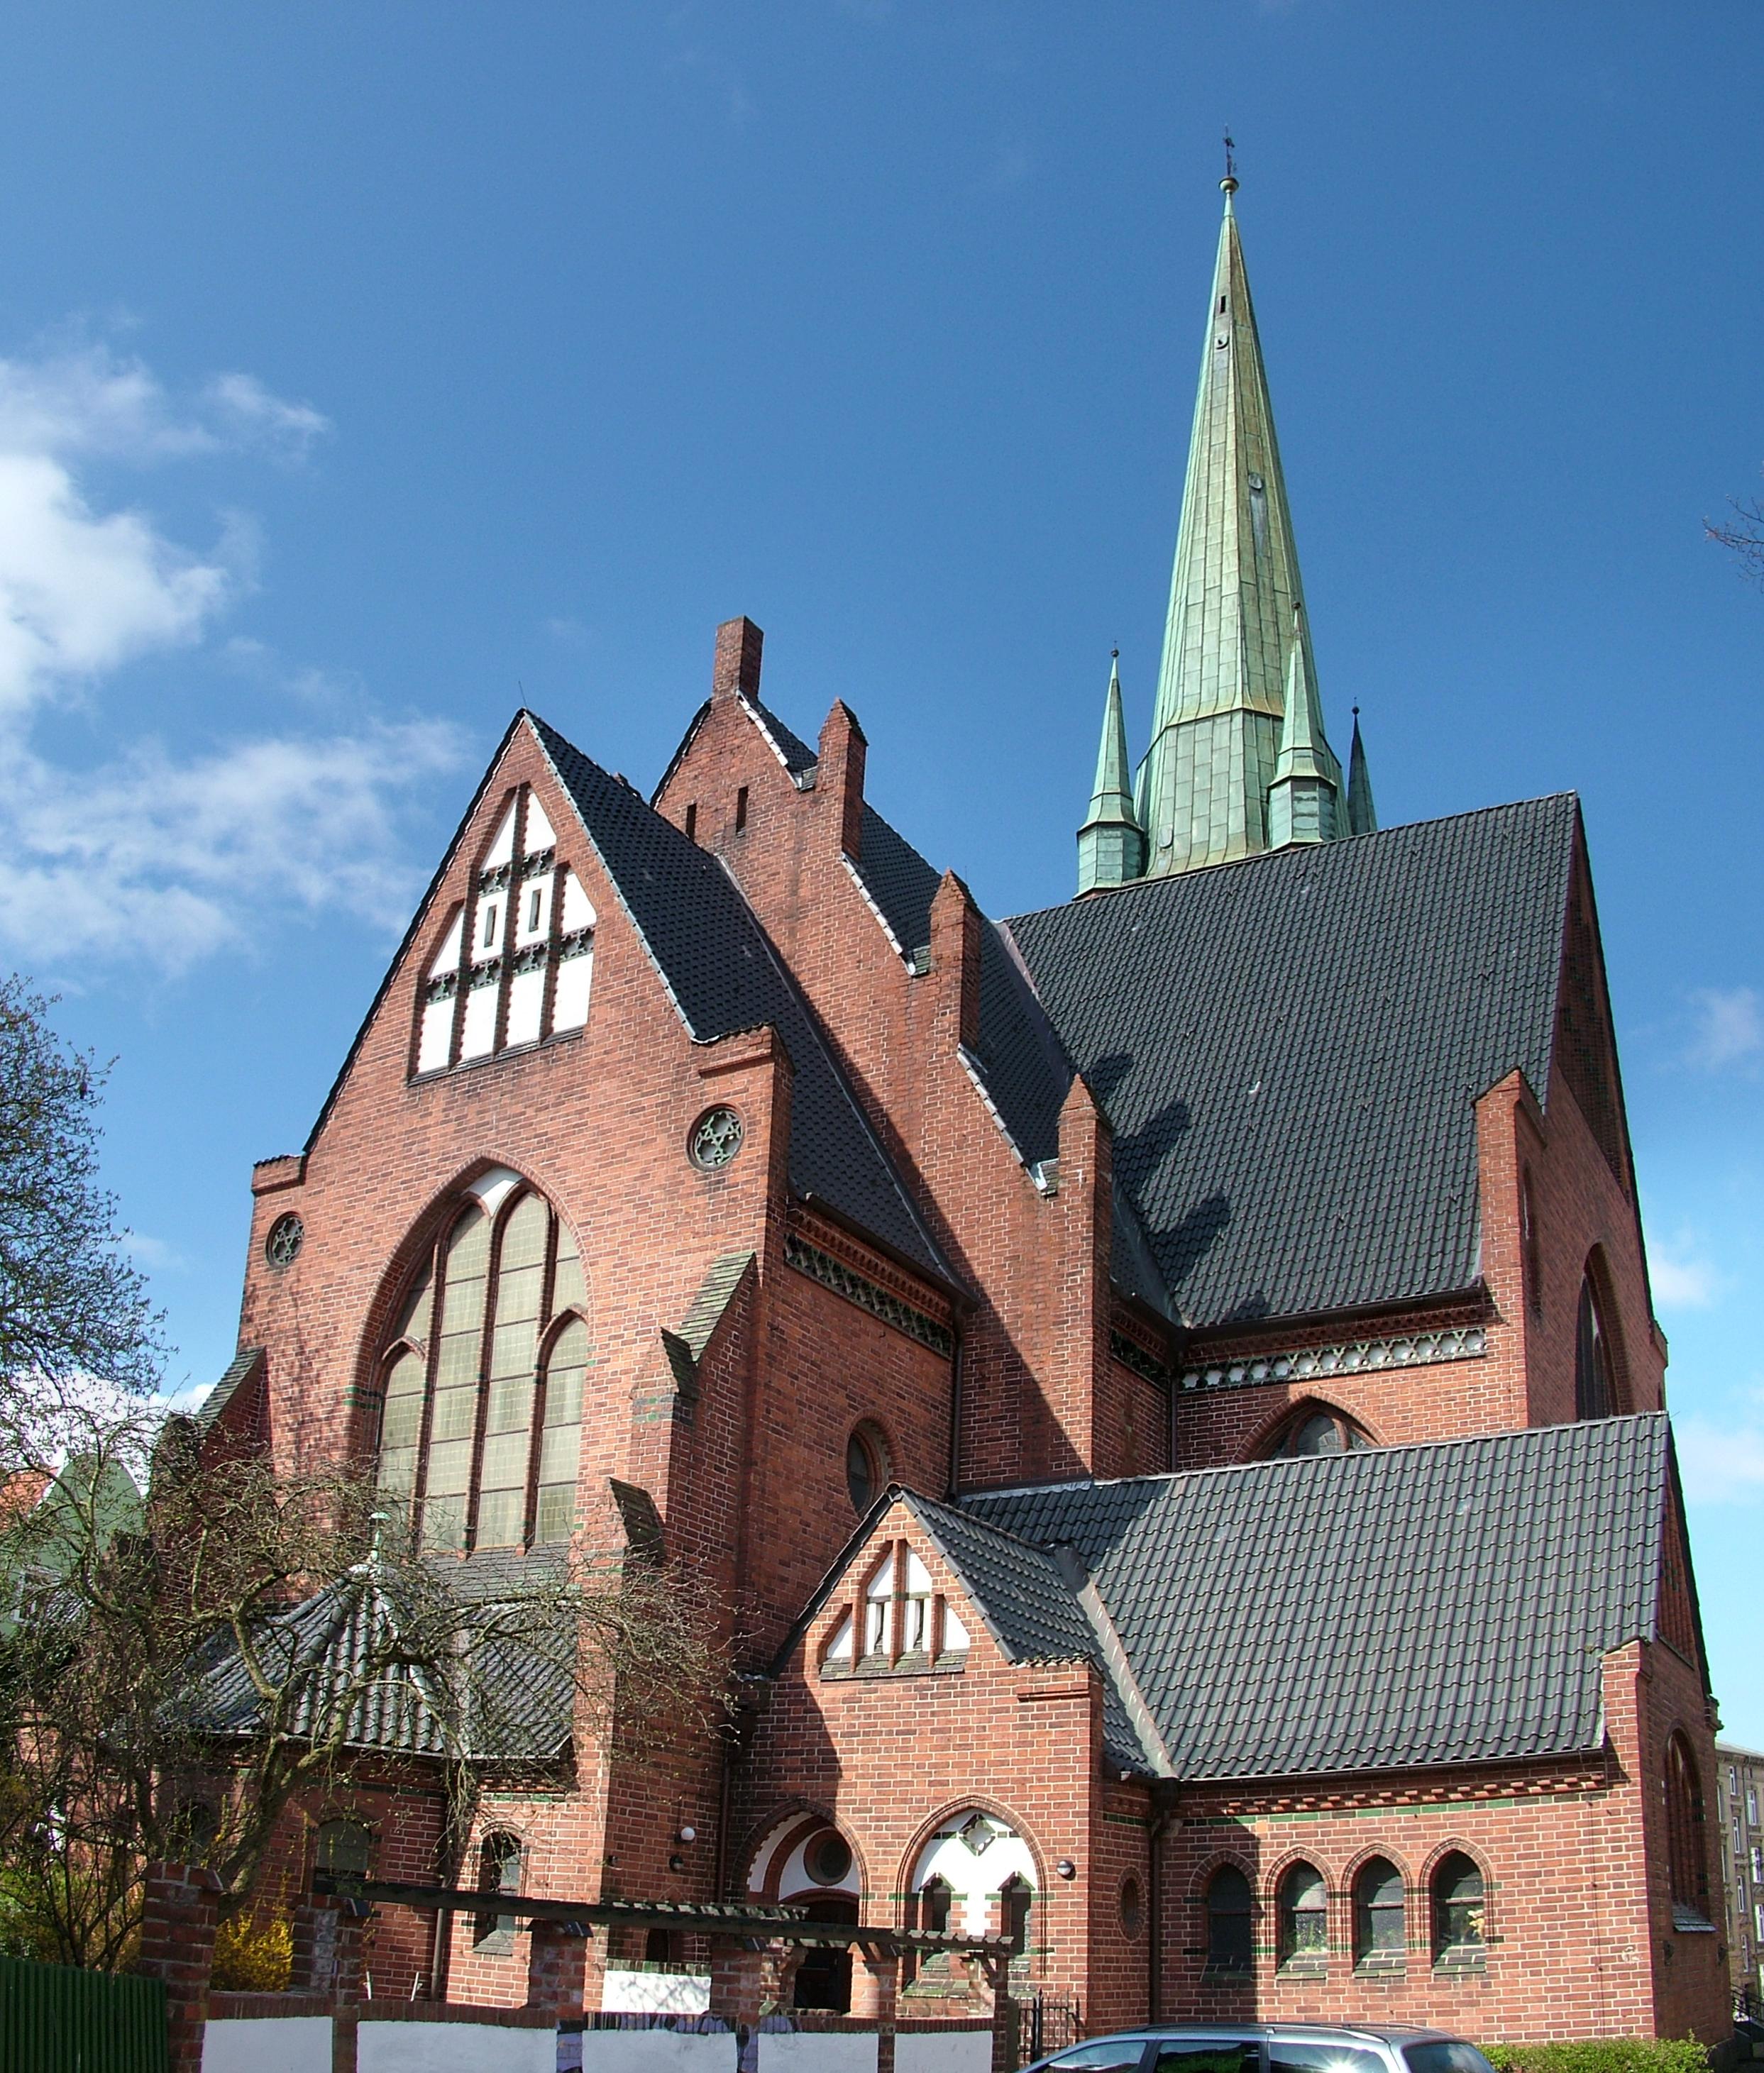 Rostock Heiligen Geist Kirche